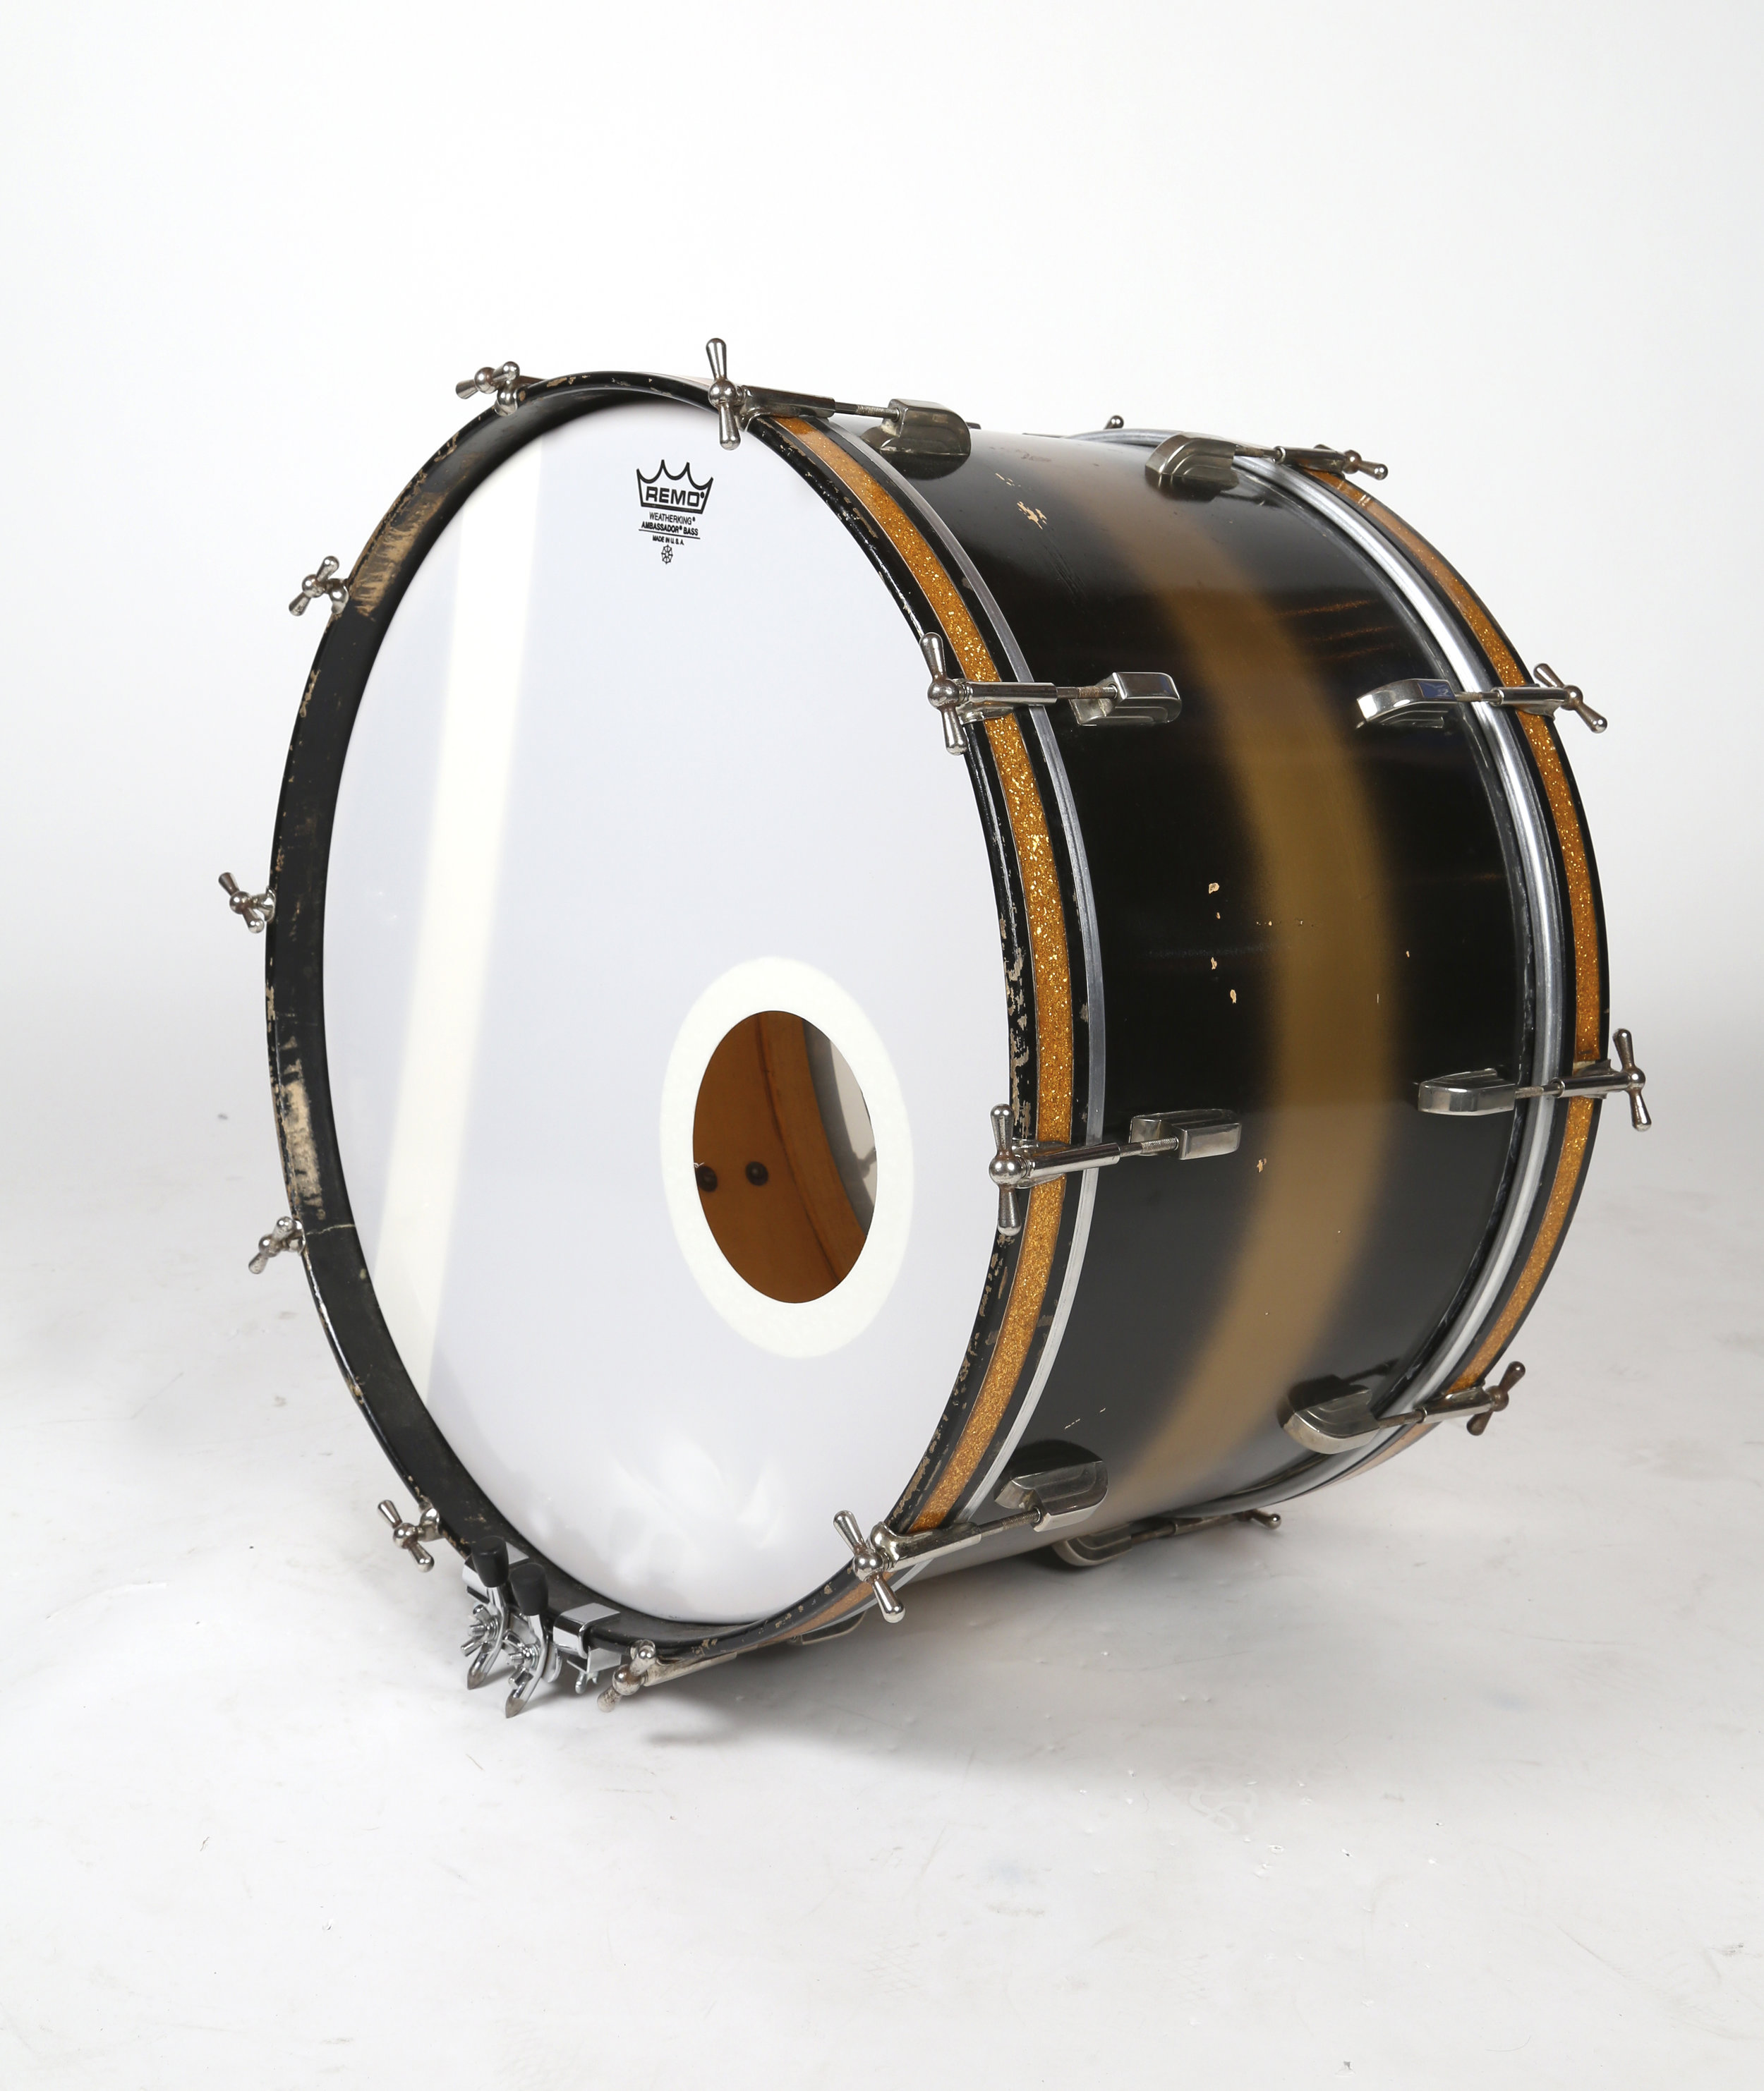 Dorio Vintage Drum_C&C Big Red_1958.jpg